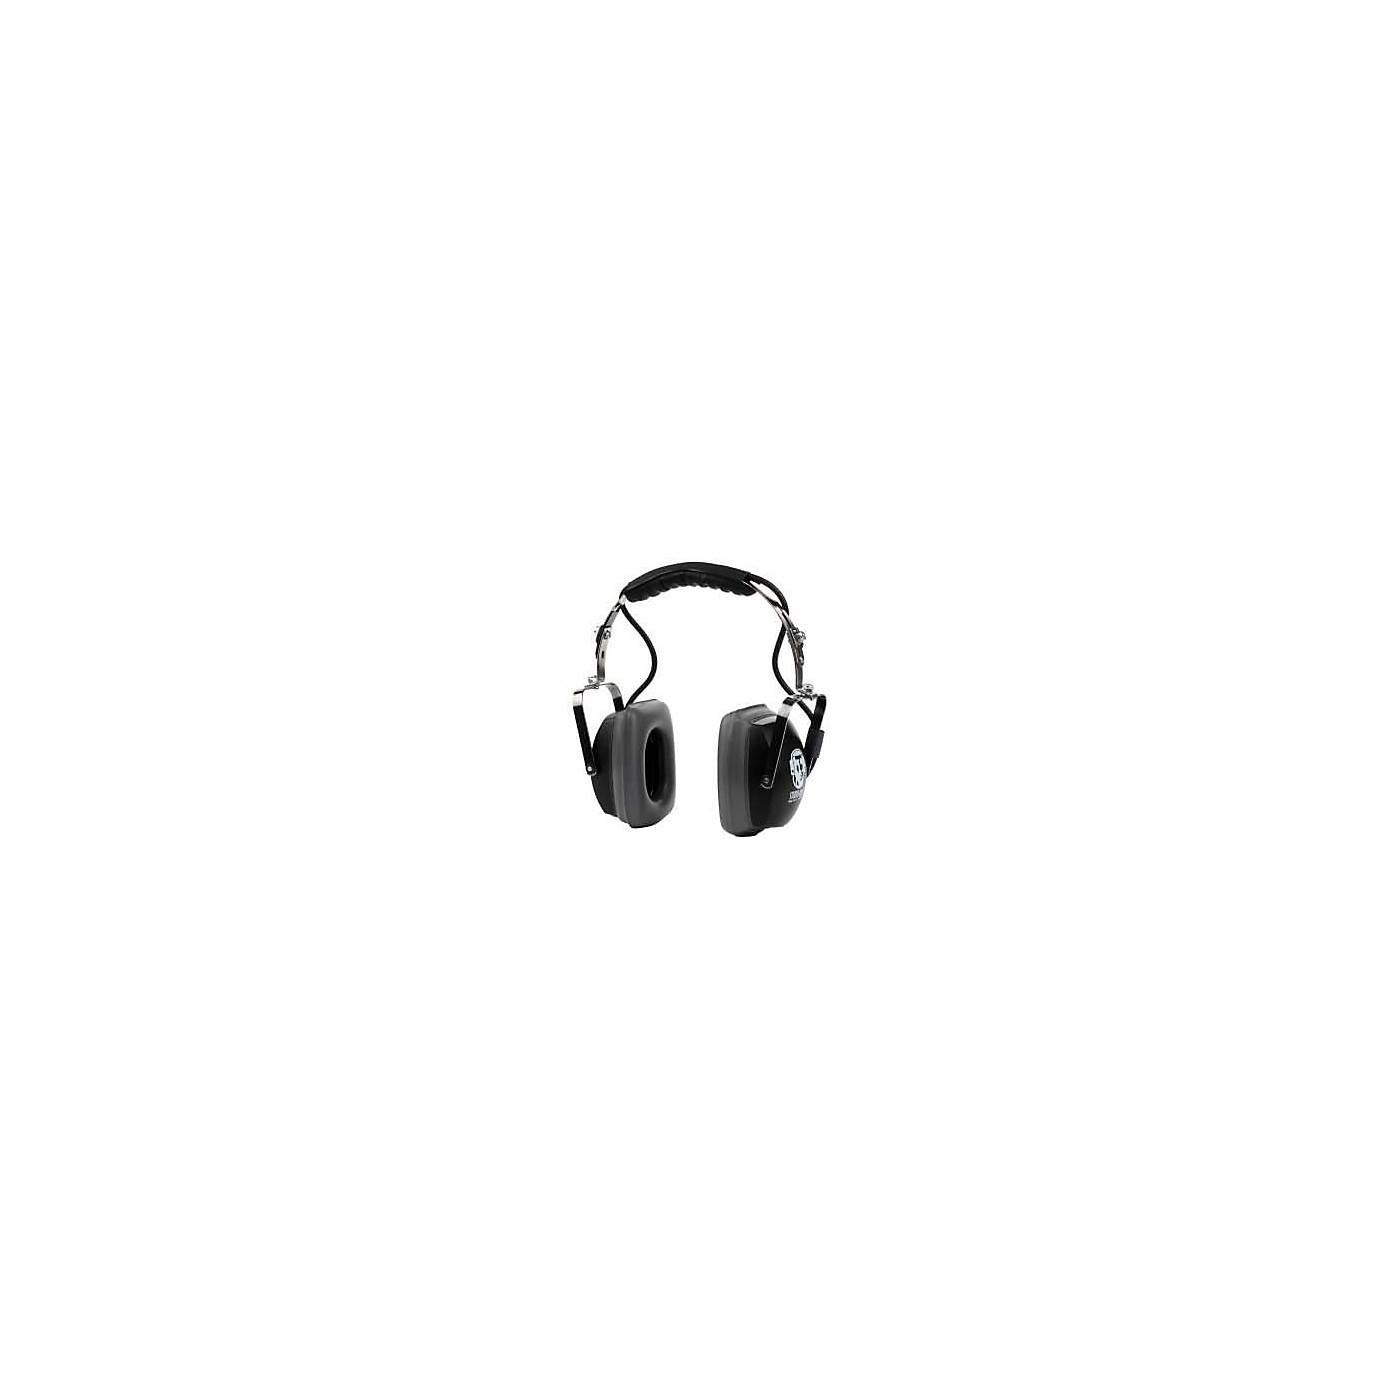 Metrophones Studio Kans Headphones with Gel-Filled Cushions thumbnail